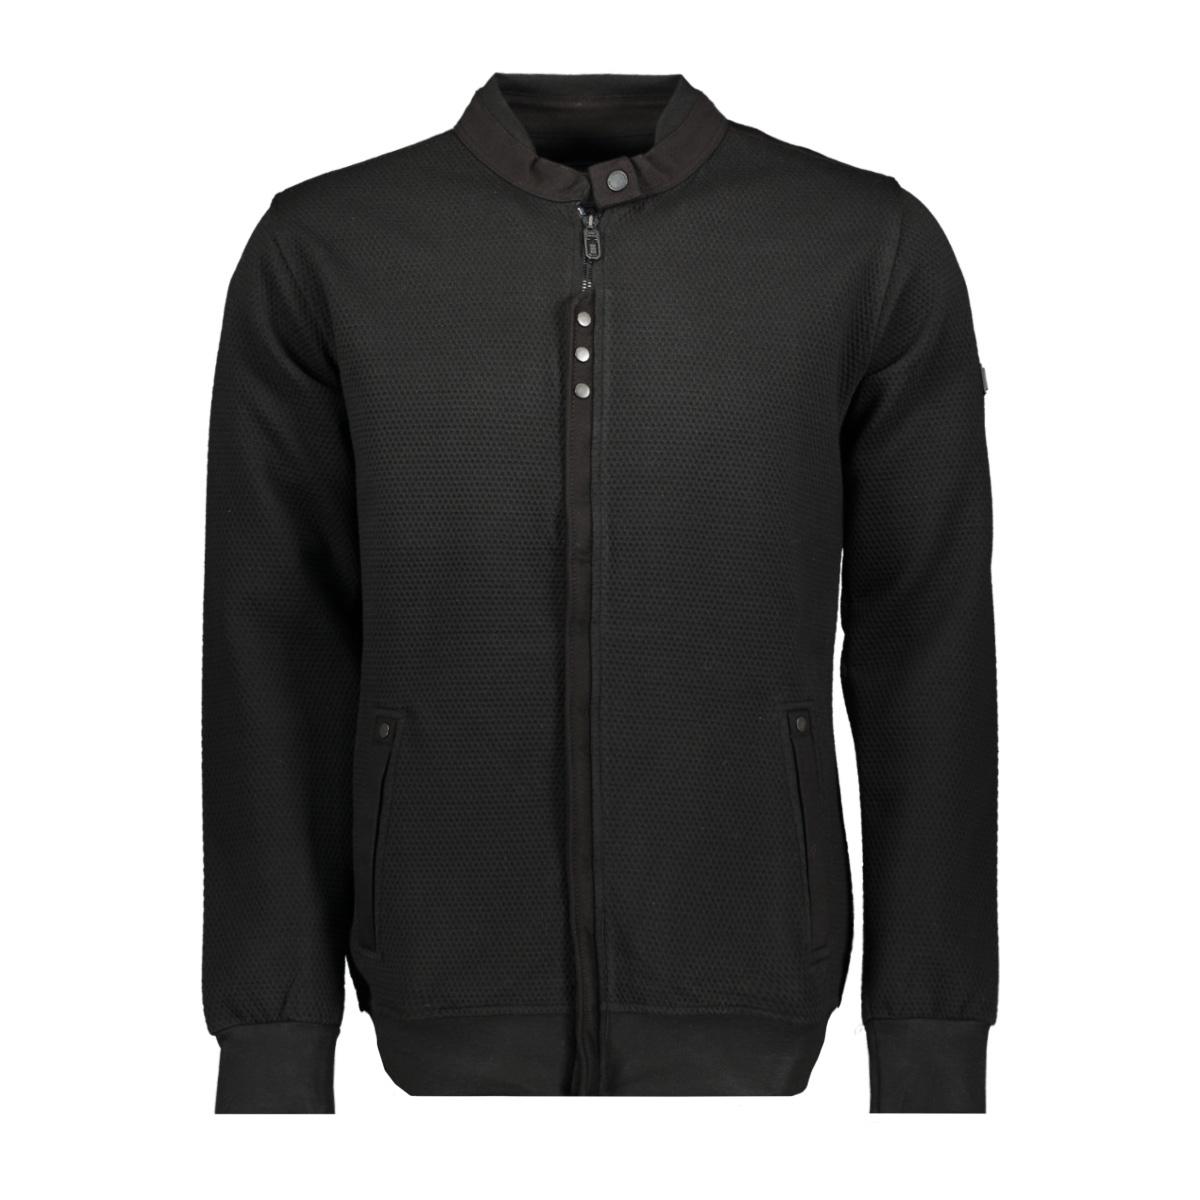 42340 gabbiano vest black